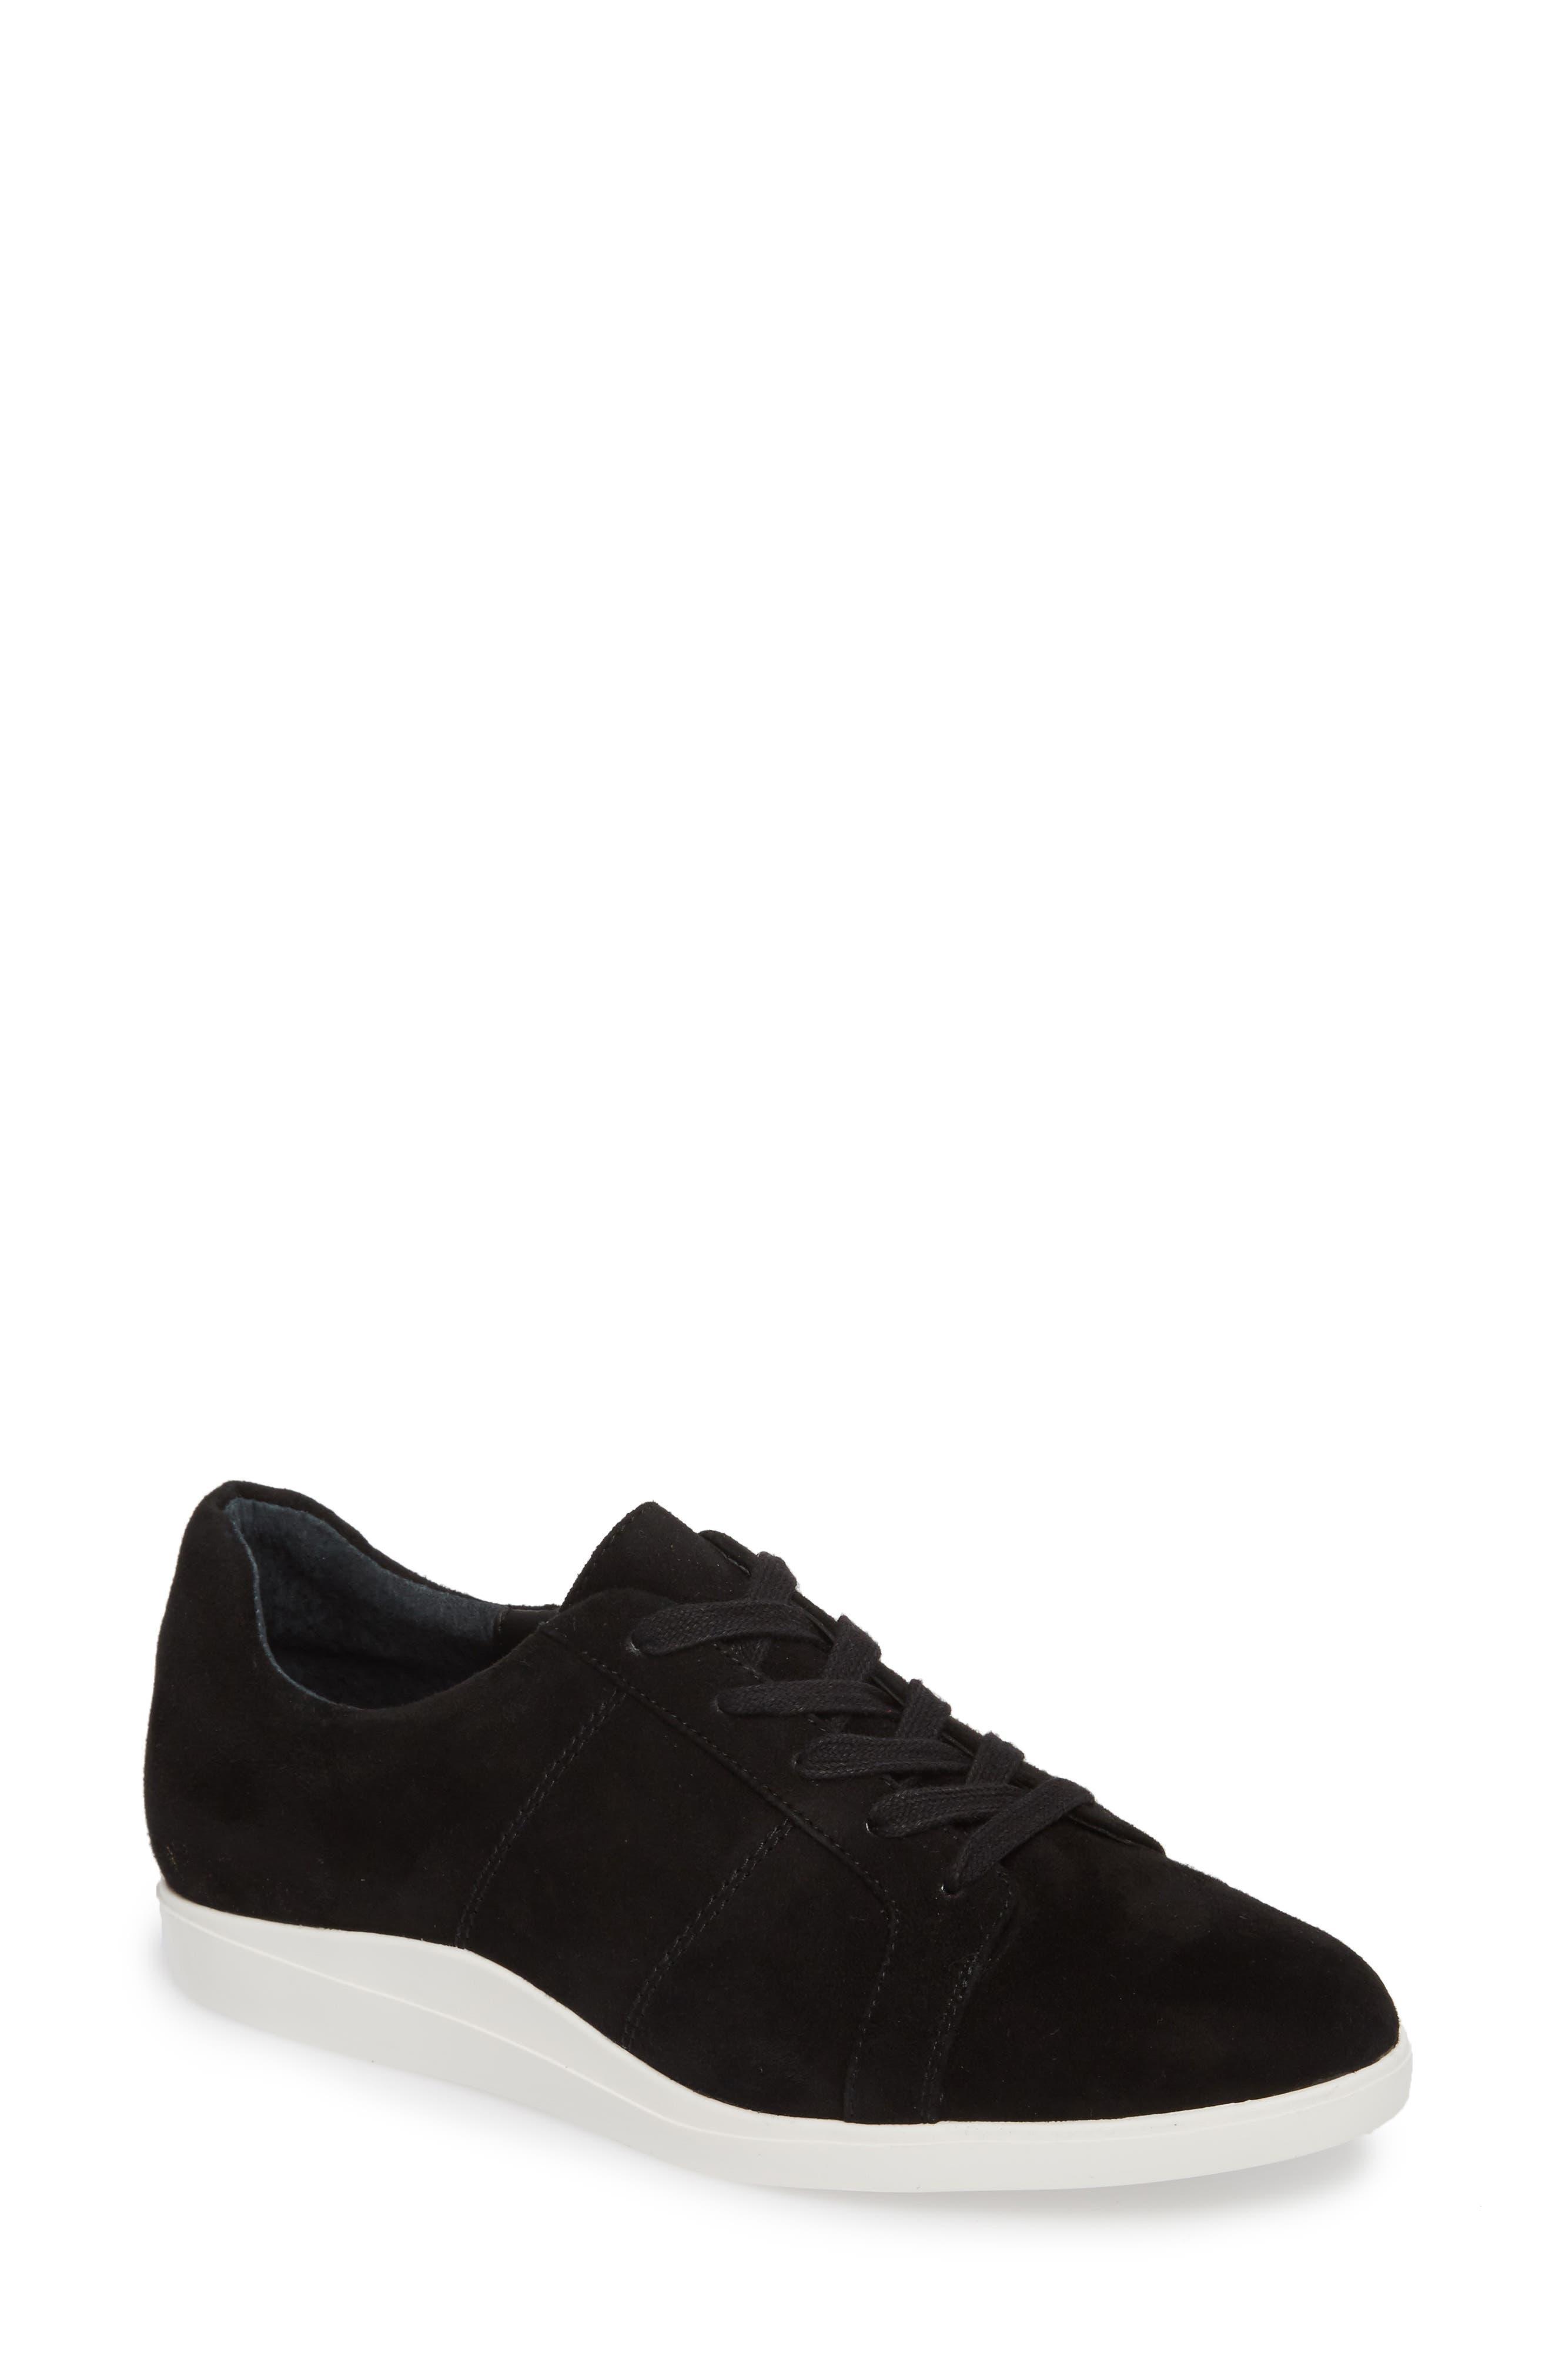 Sharleen Sneaker,                             Main thumbnail 1, color,                             001